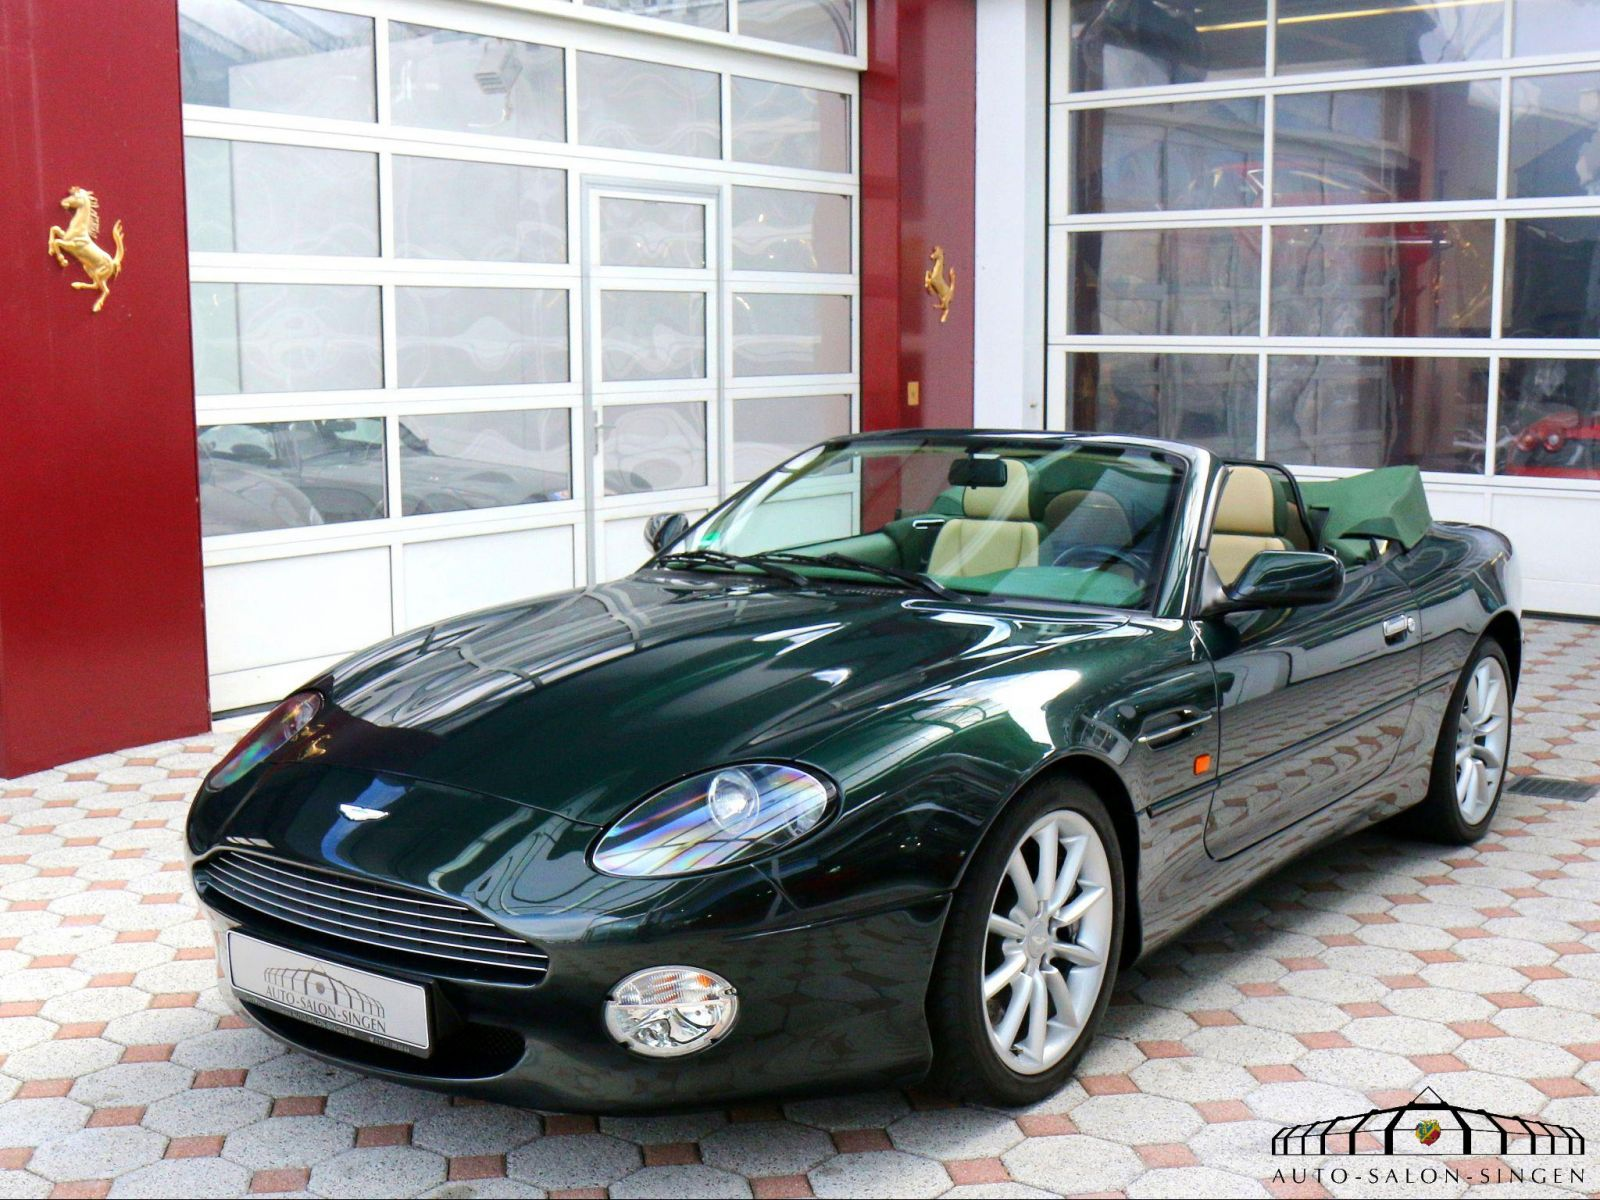 Aston Martin Db7 Vantage Volante Cabrio Auto Salon Singen